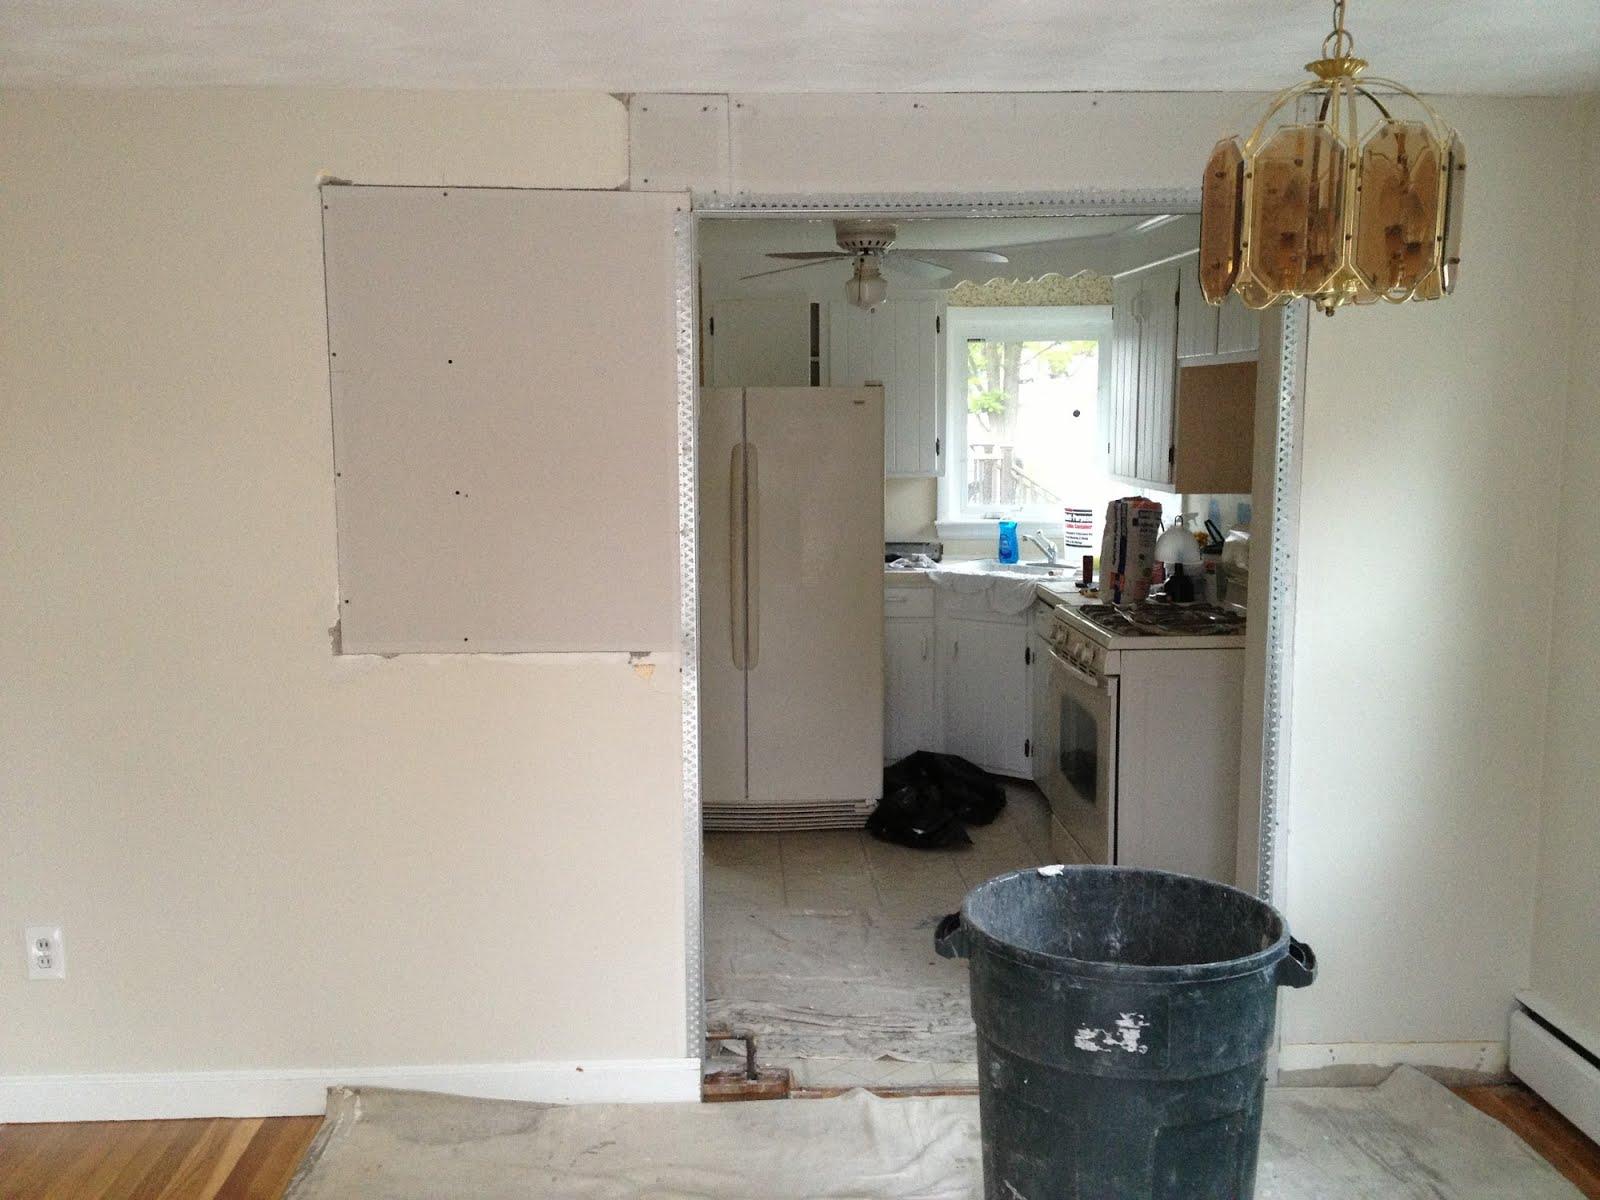 wallpapercomphotosherwin williams temporary wallpaper35html 1600x1200